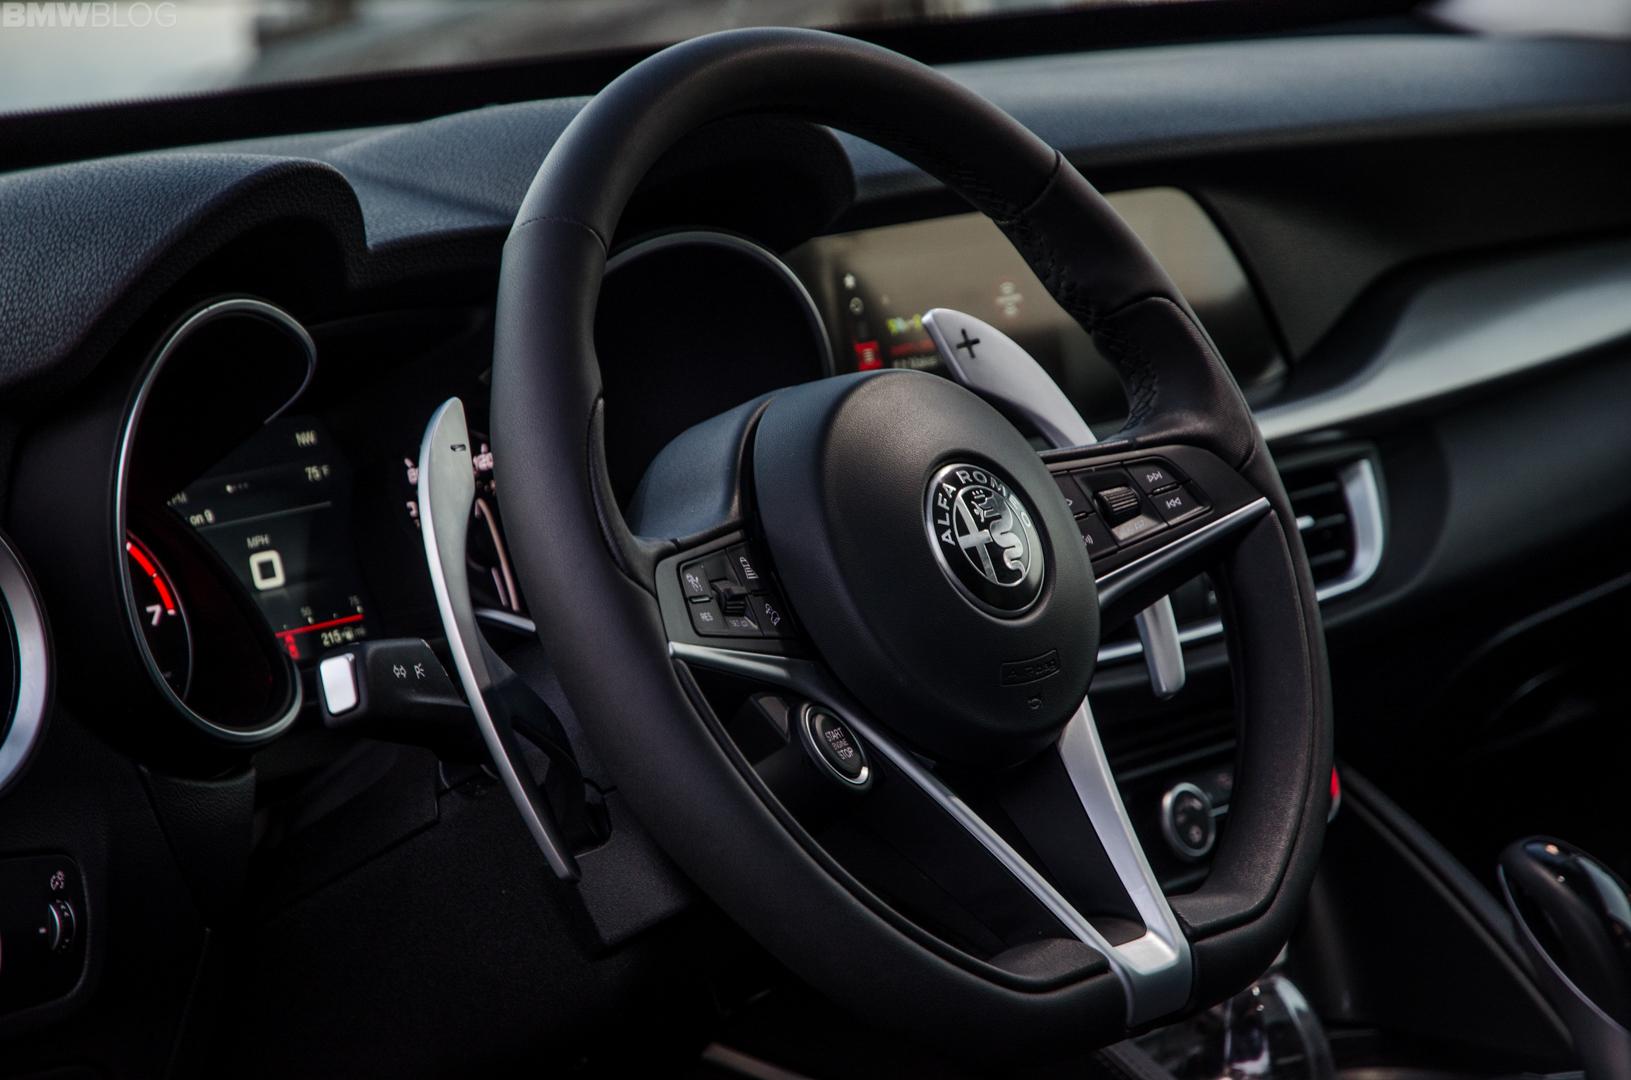 Alfa Romeo Stelvio Steering Wheel >> First Drive Alfa Romeo Stelvio The Leaning Tower Of Alfa Romeo